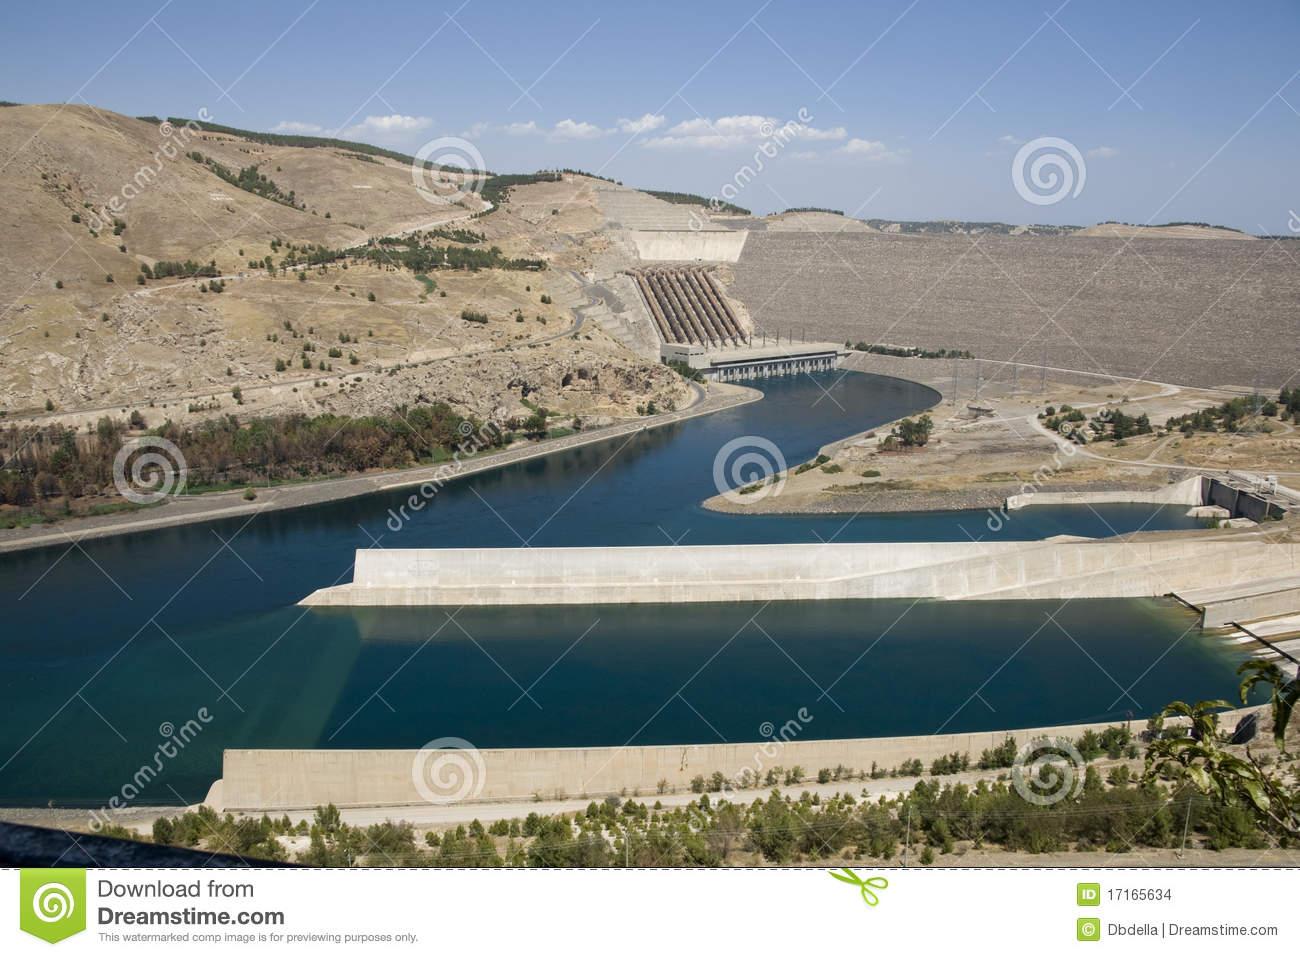 Ataturk Dam On The Euphrates River.